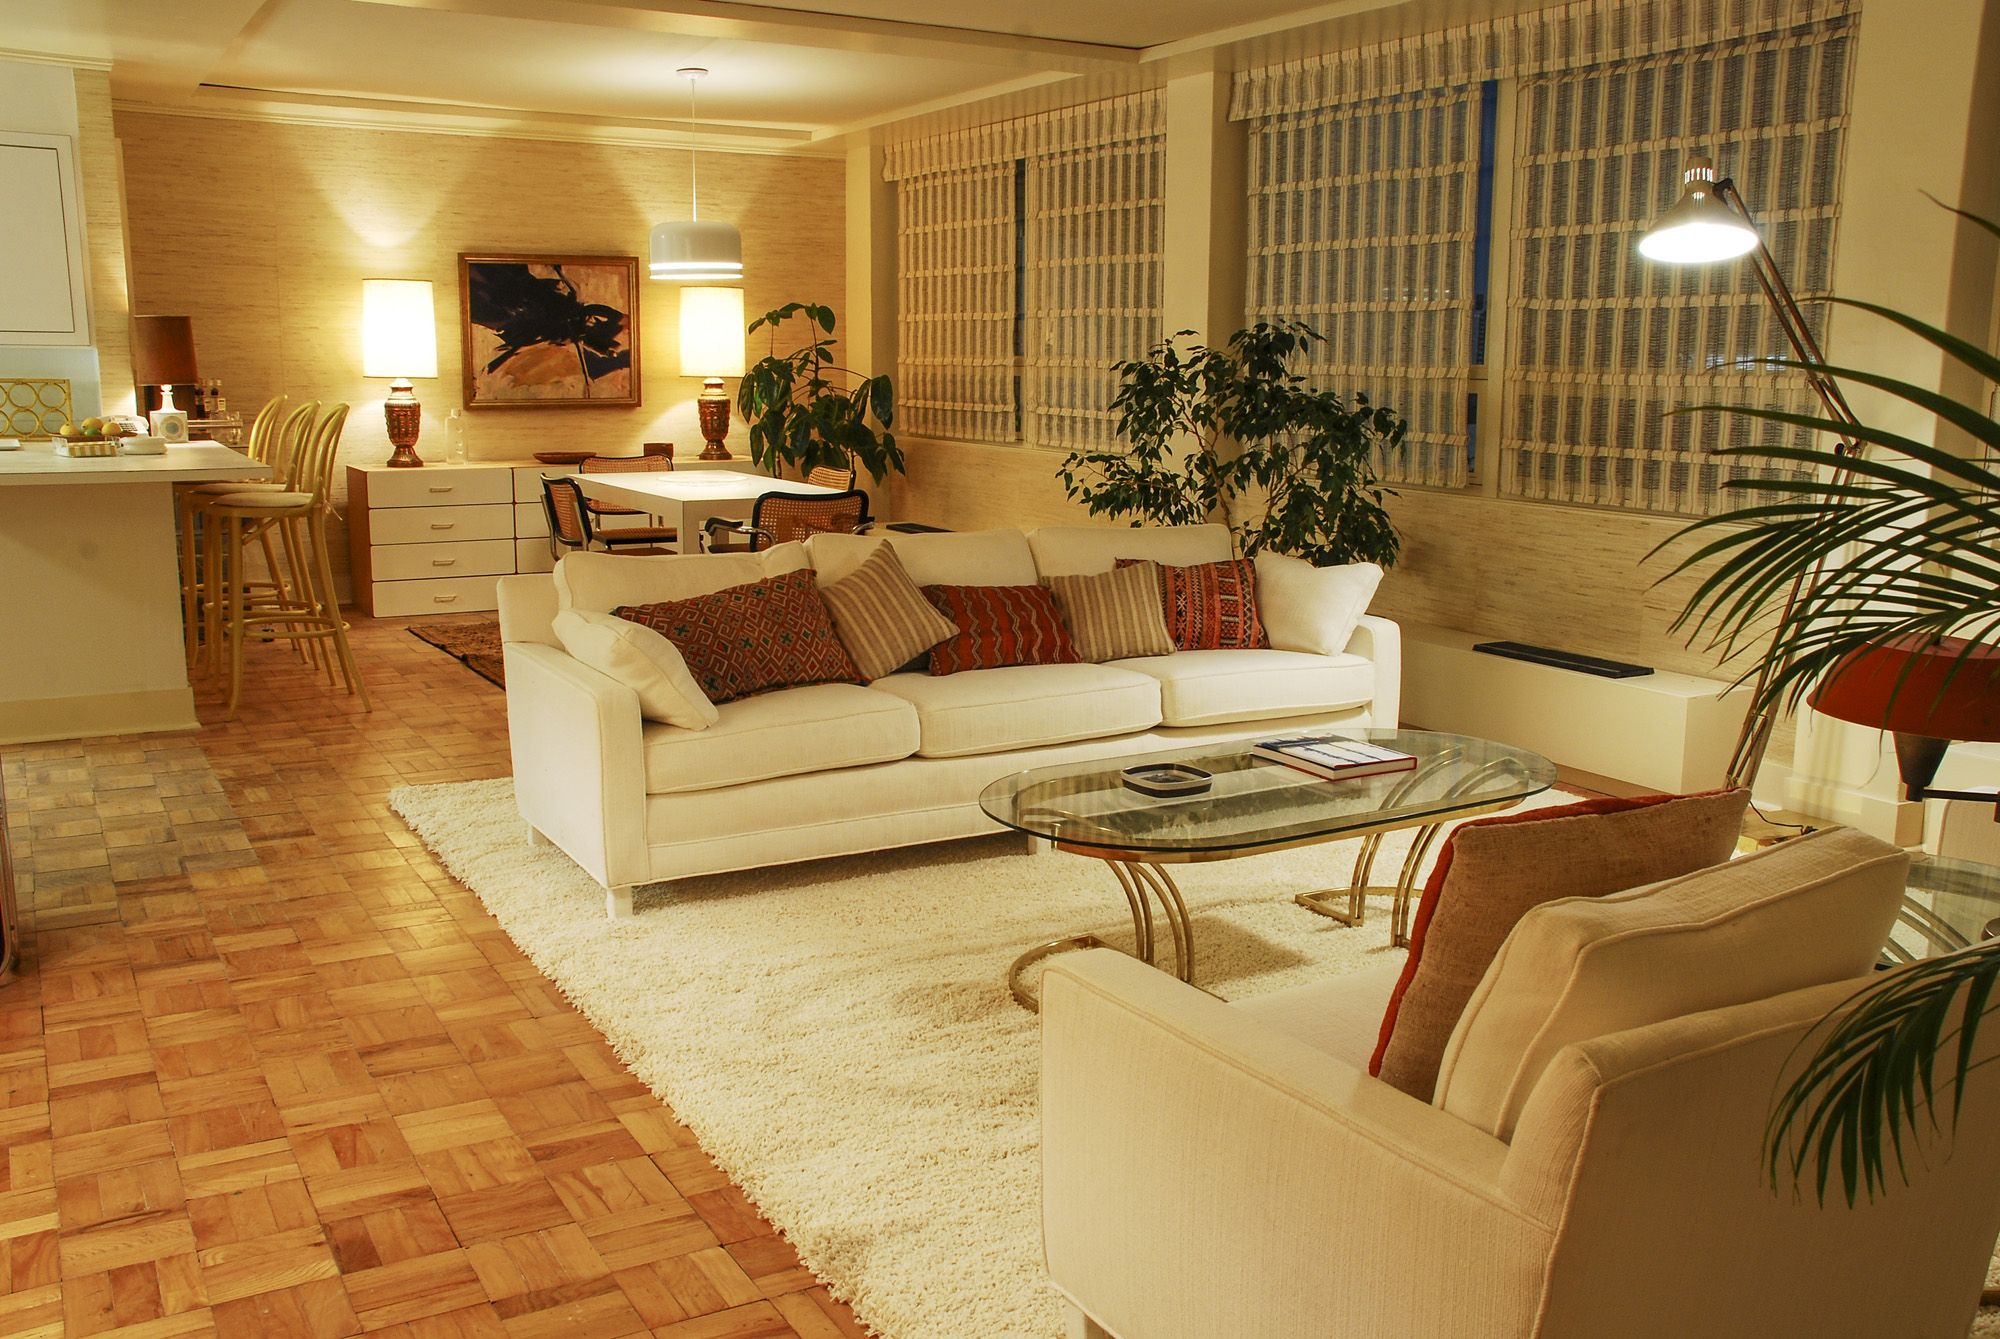 Sydney Apartment 3 Set of Sydneys played by Amy Adams